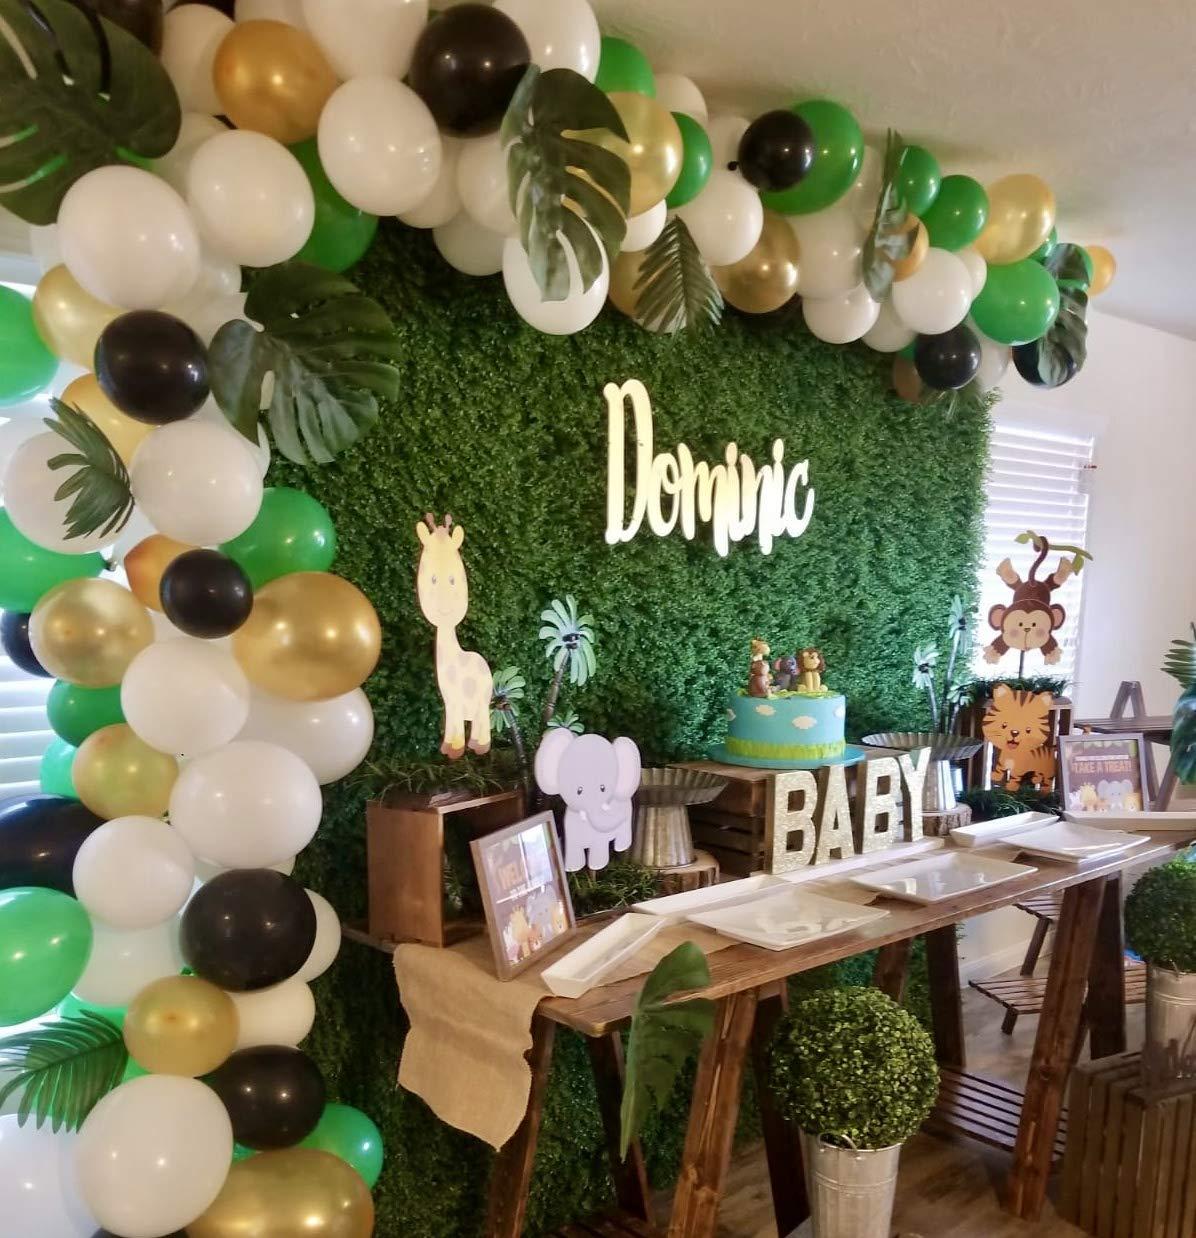 Instapalm Jungle Theme Party Supplies | Premium 163pcs Safari Balloon Garland Kit - 130pcs Inflatable Green, Gold Balloons, 20pcs Green Palm Leaves | Kids Boy Birthday Baby Shower Safari Decorations